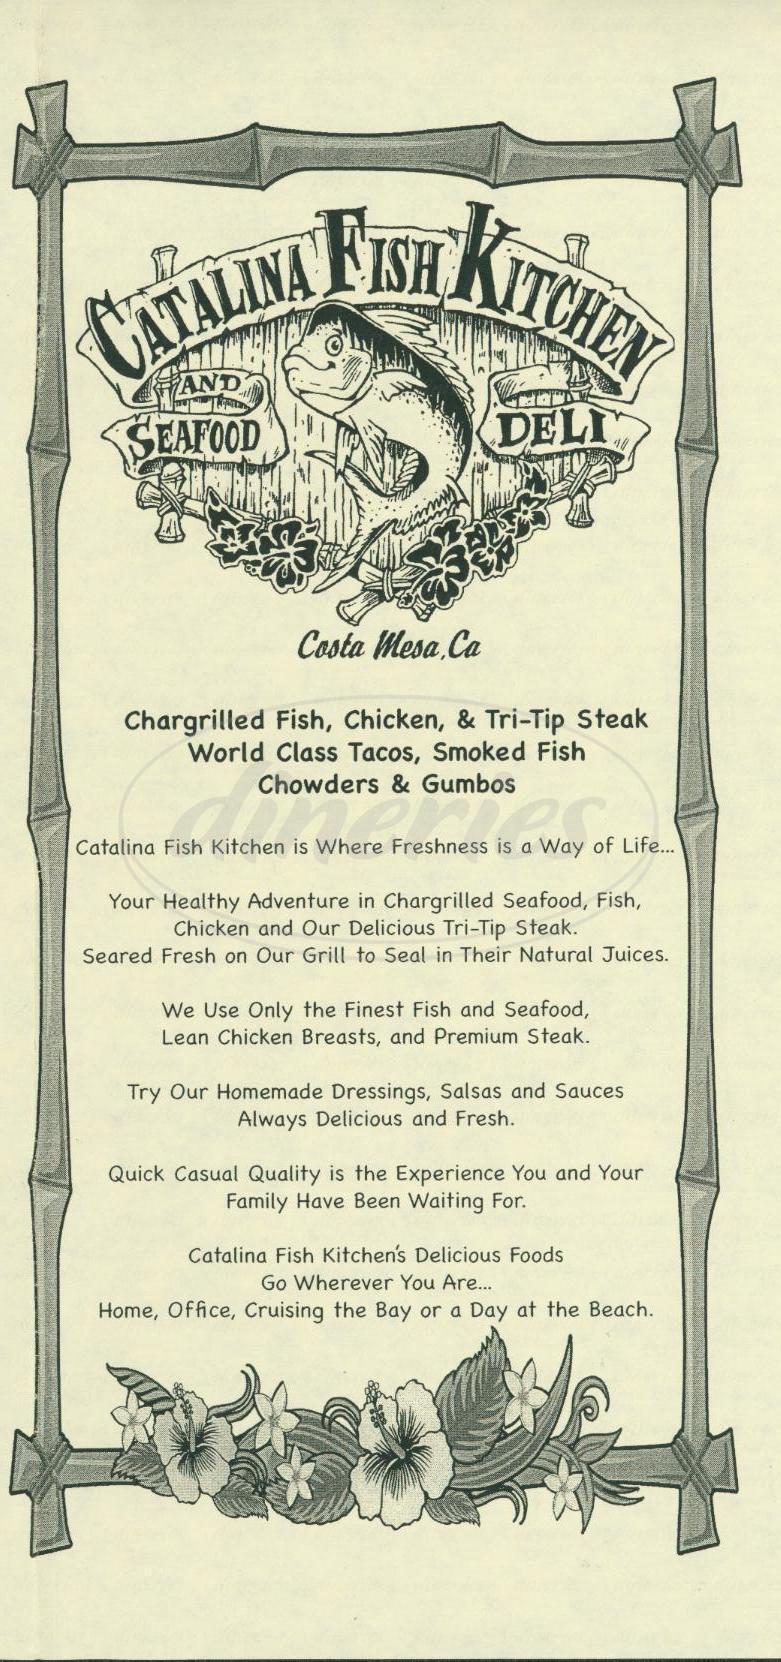 menu for Catalina Fish Kitchen